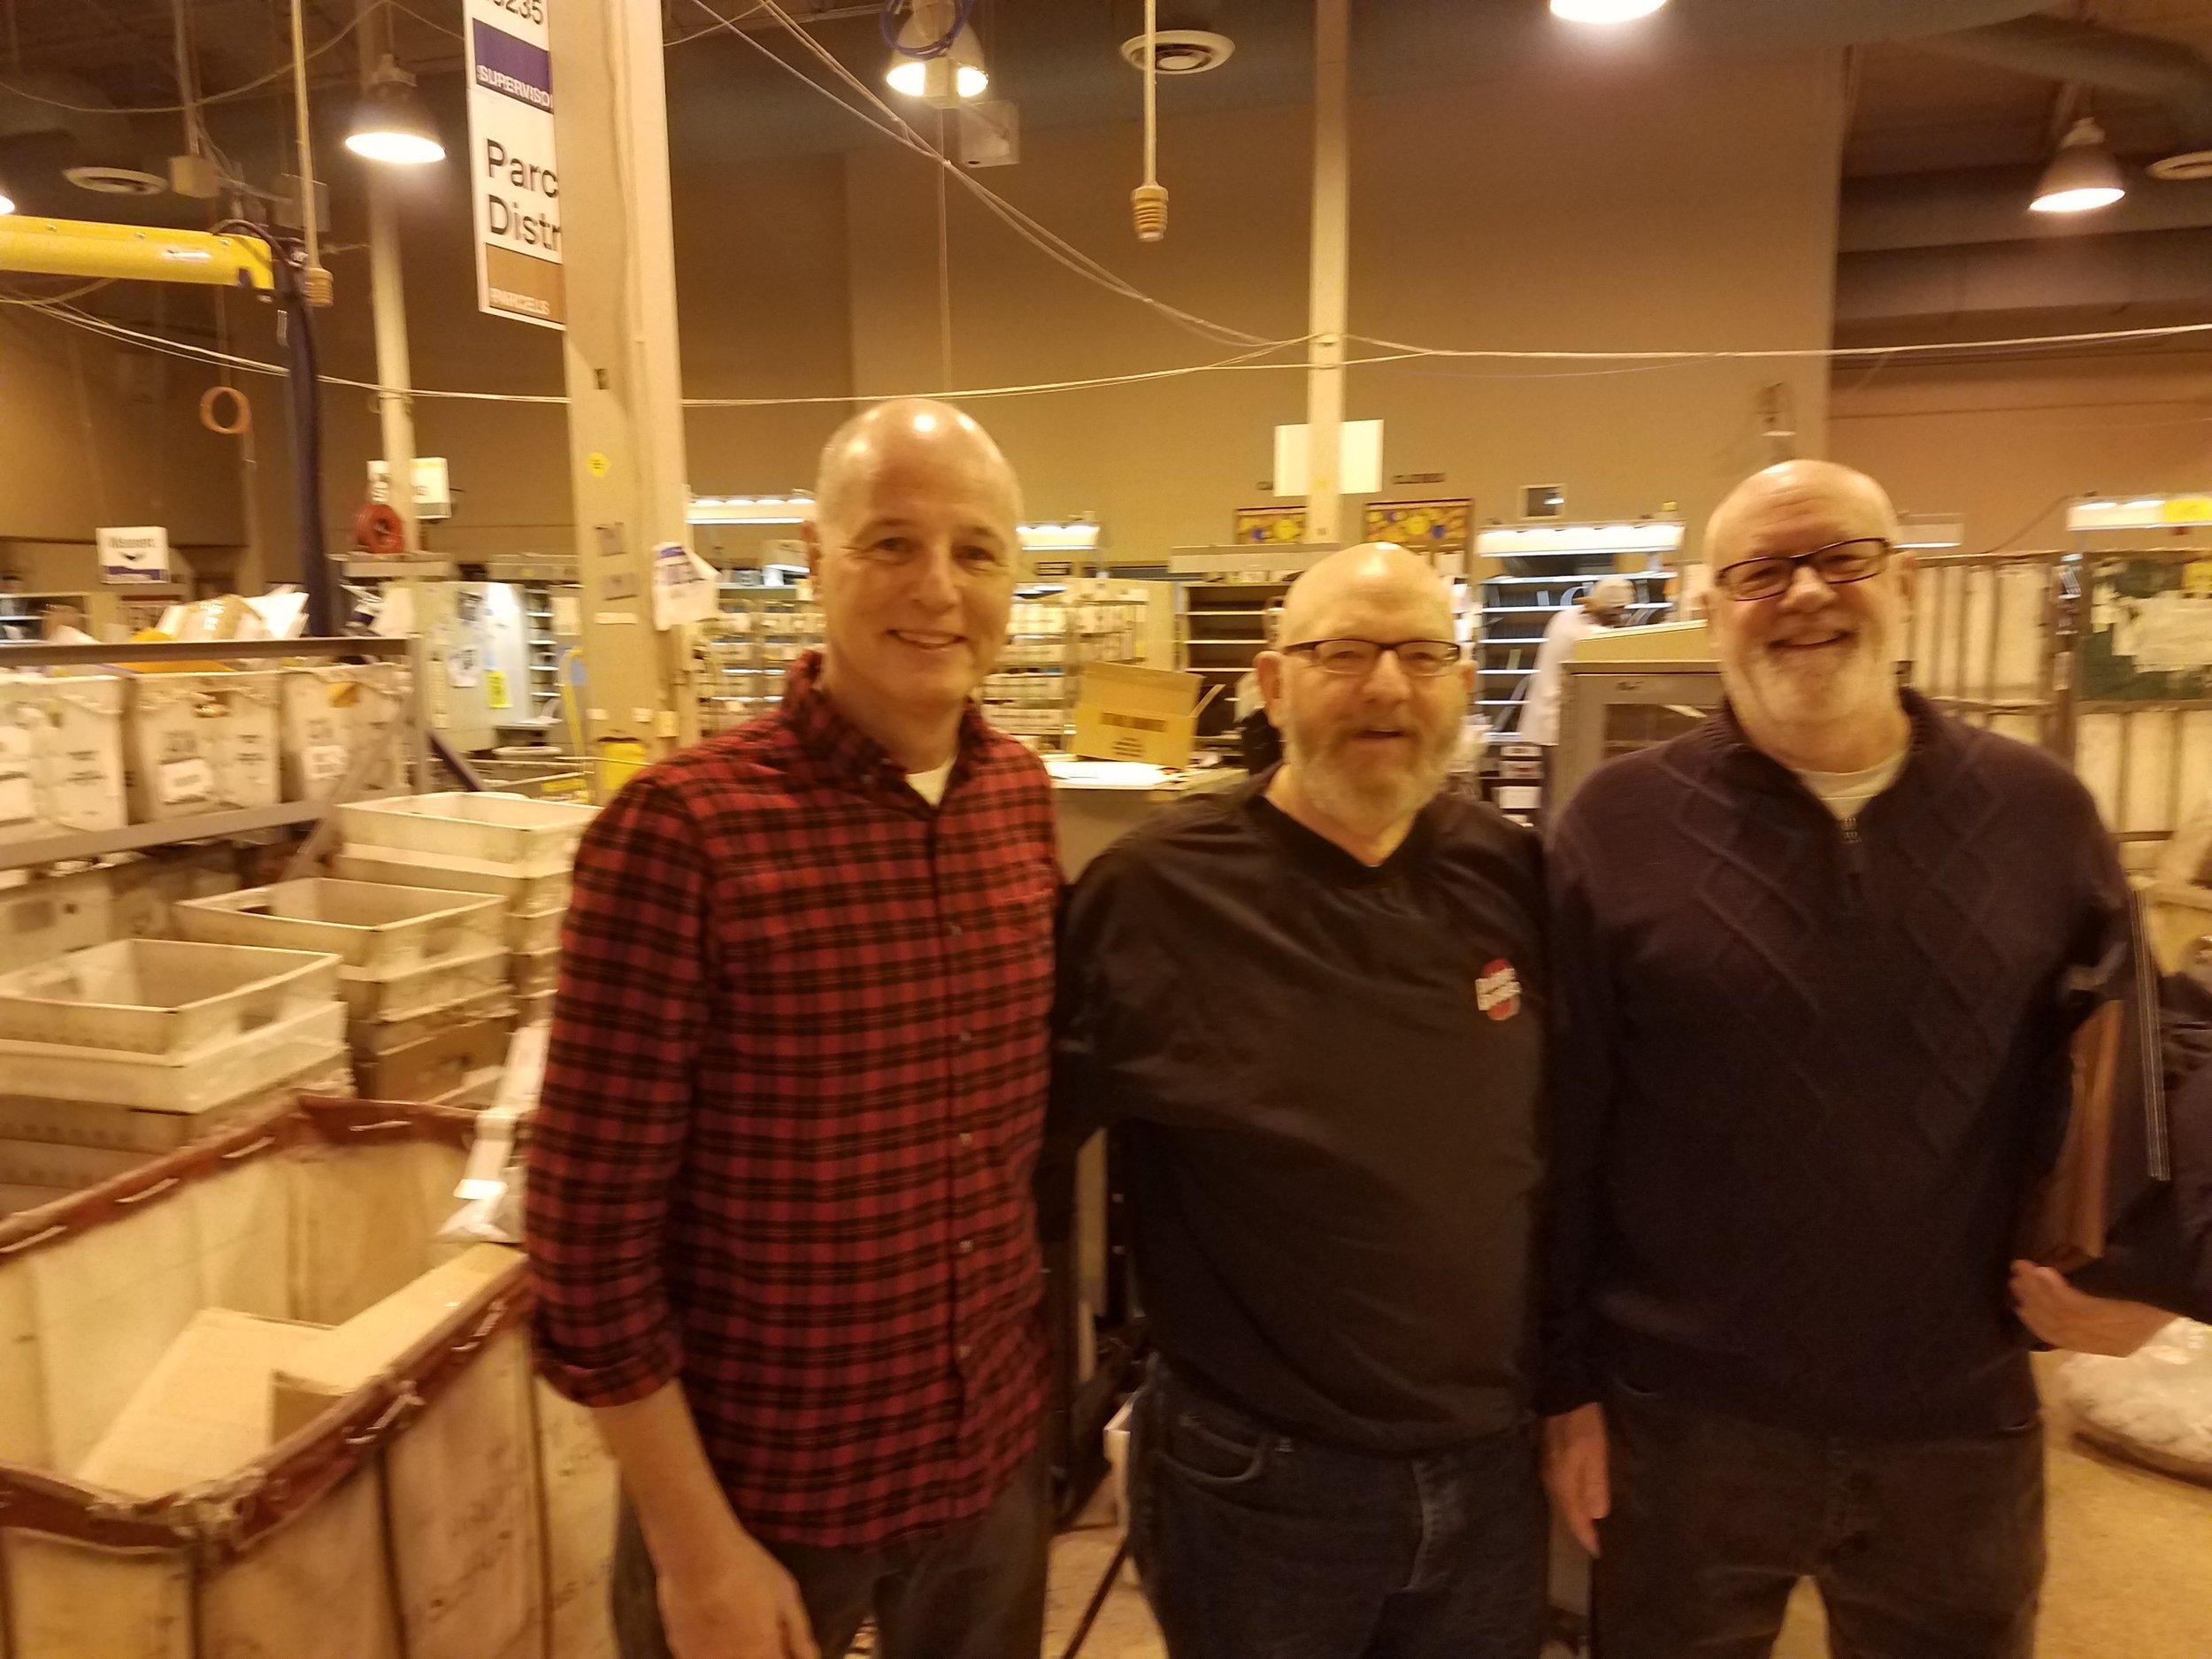 Mike Jasiewicz, Jim Kaiser & Keith Maloney retired from West Worthington